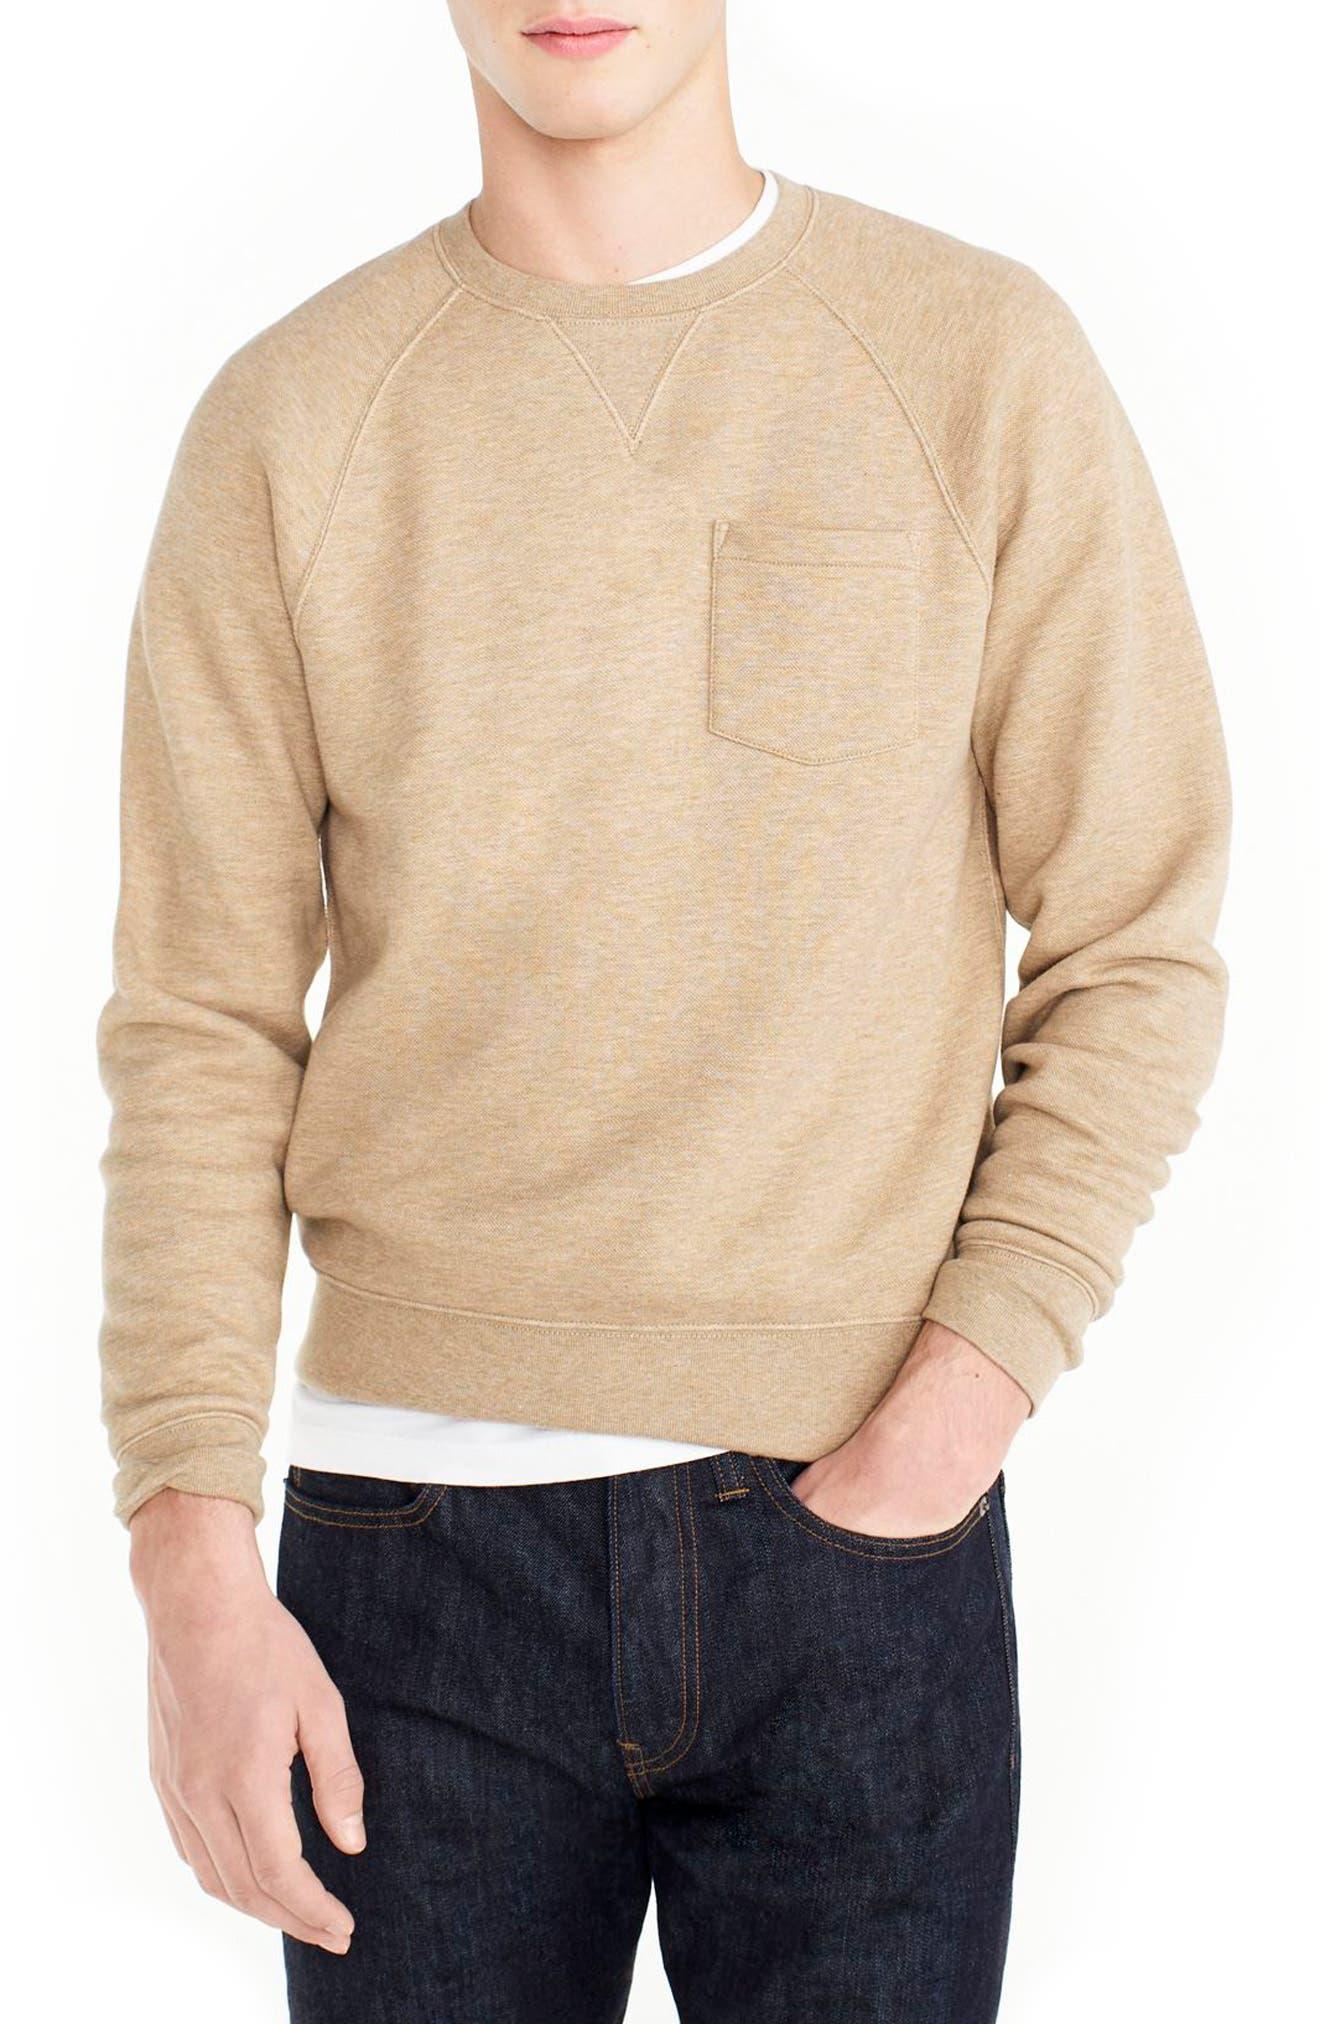 Textured Piqué Fleece Sweatshirt,                             Main thumbnail 1, color,                             Heather Nut